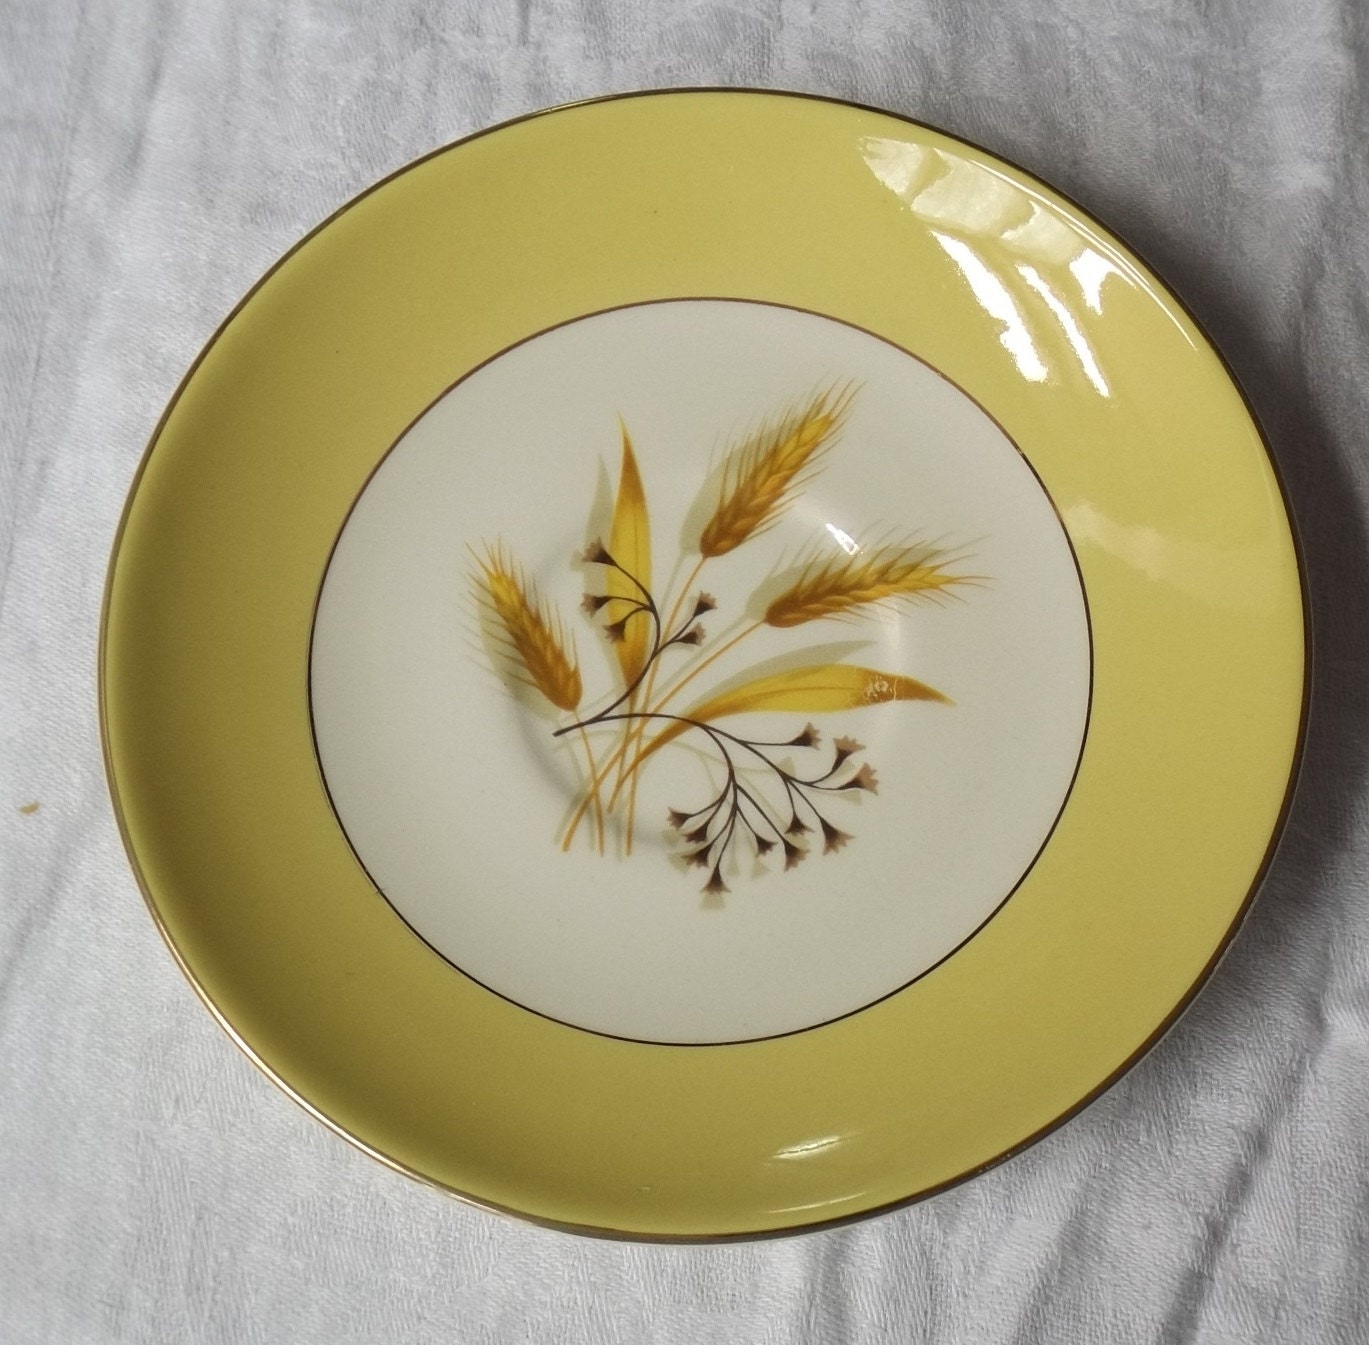 tea cup saucer with a wheat motif Century Service Corporation